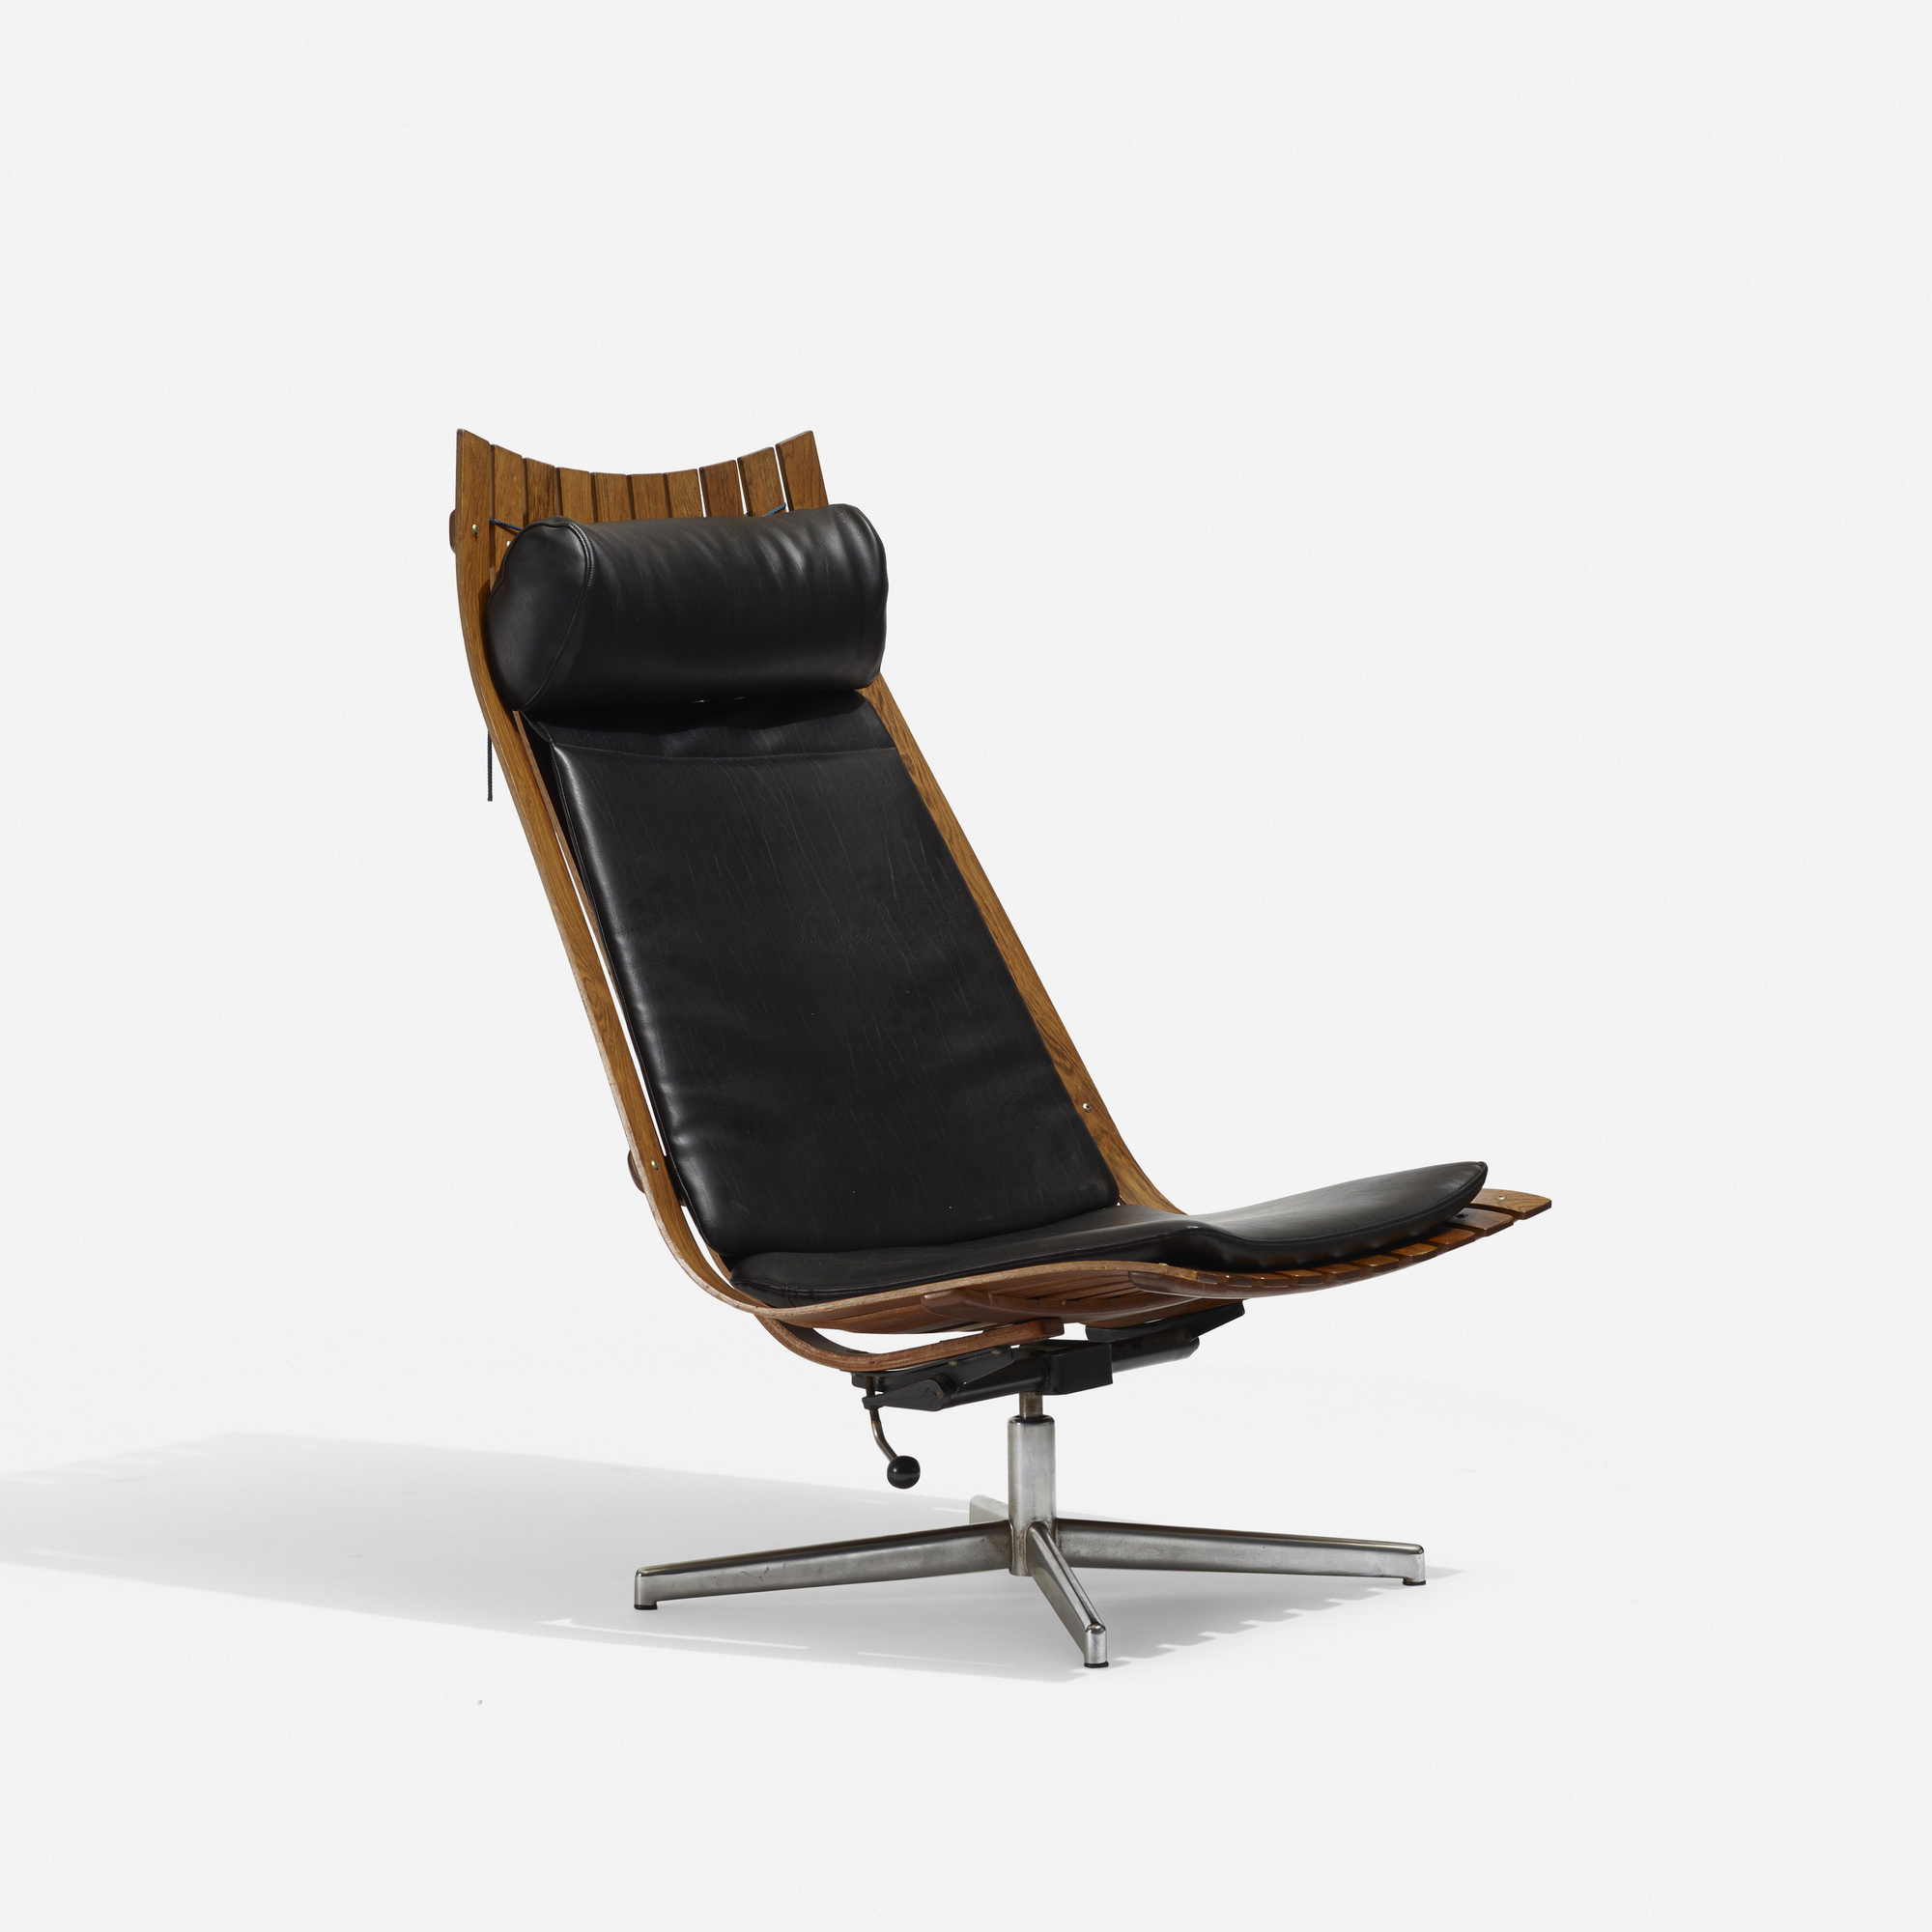 Fabulous 217 Hans Brattrud Scandia Nett Swivel Lounge Chair Ibusinesslaw Wood Chair Design Ideas Ibusinesslaworg